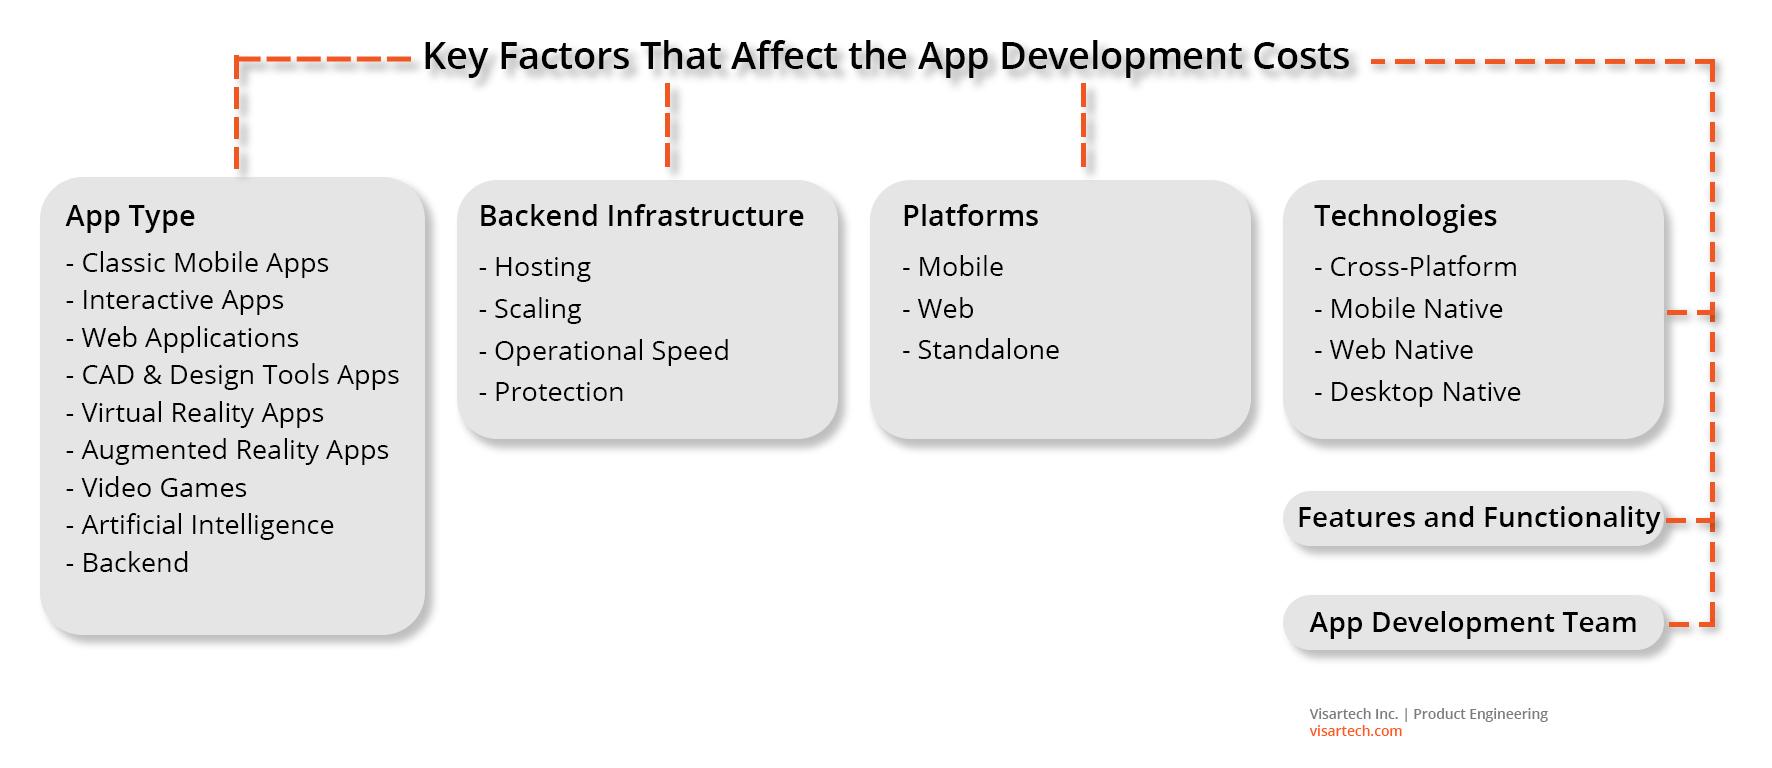 Key Factors That Affect the App Development Costs - Visartech Blog